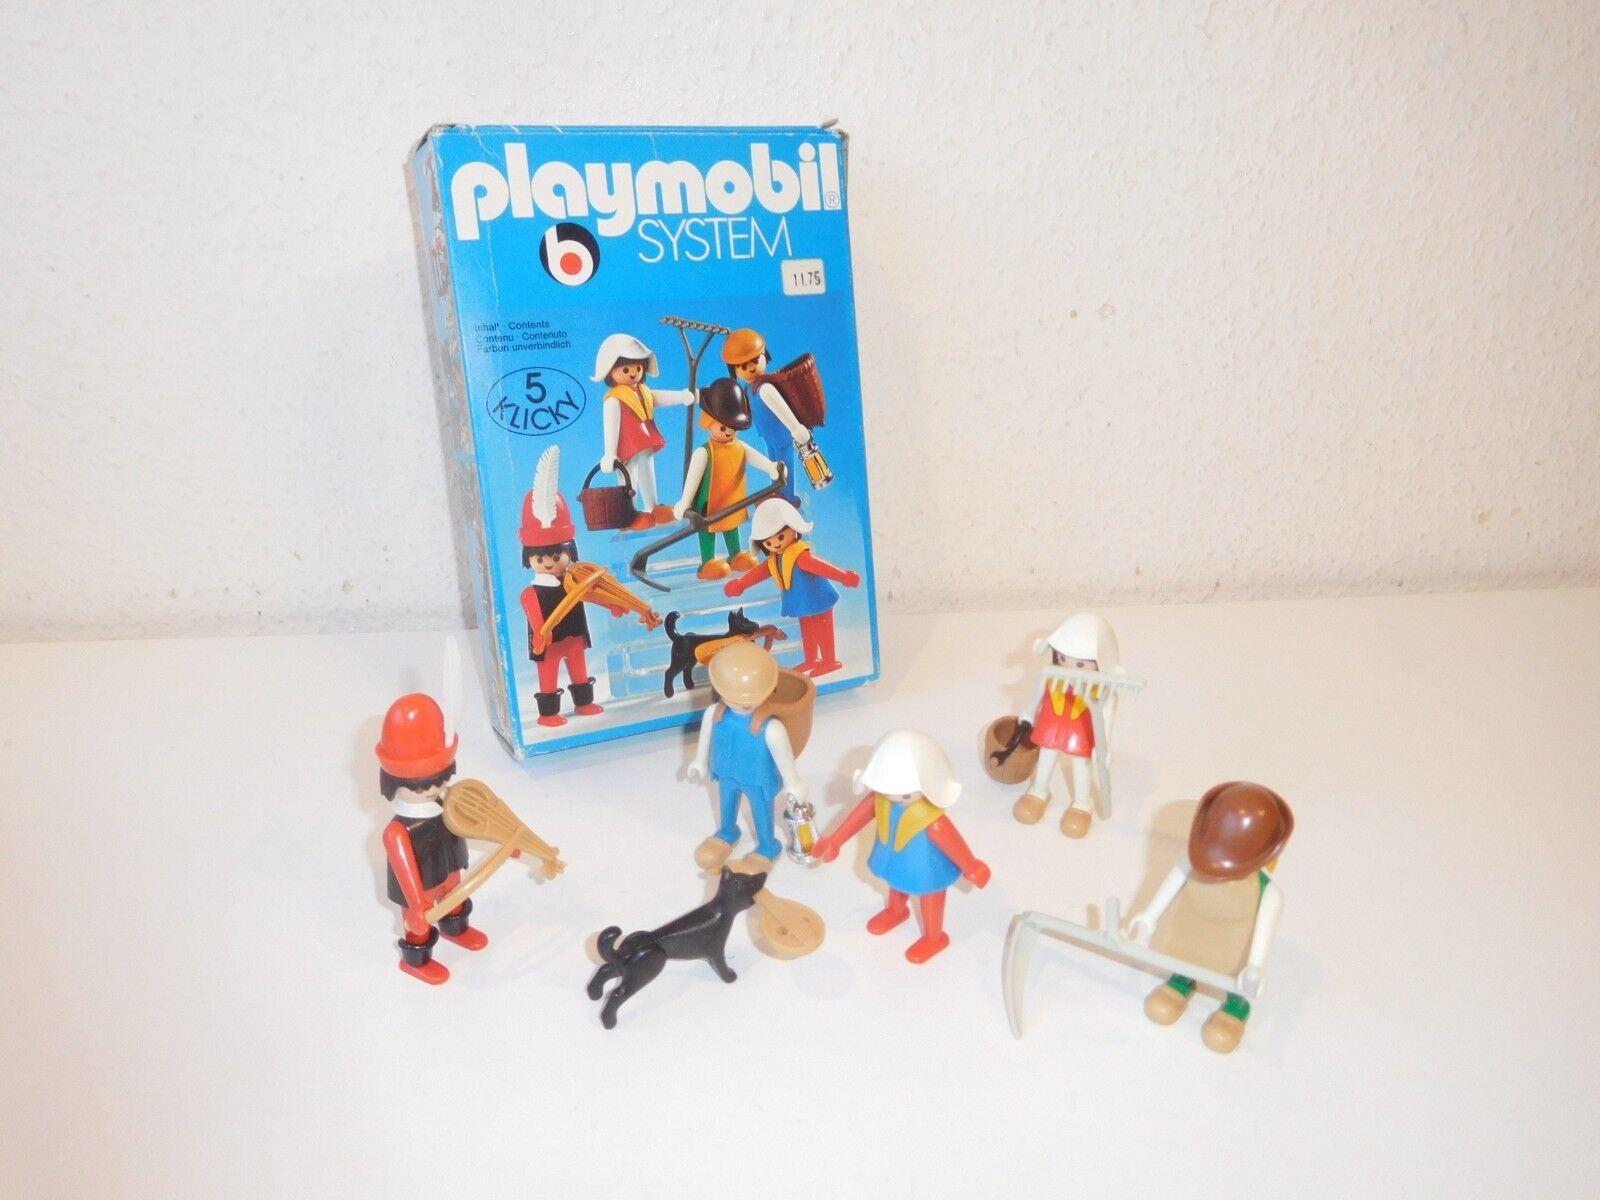 Playmobil 3293 medieval figures ovp (2)